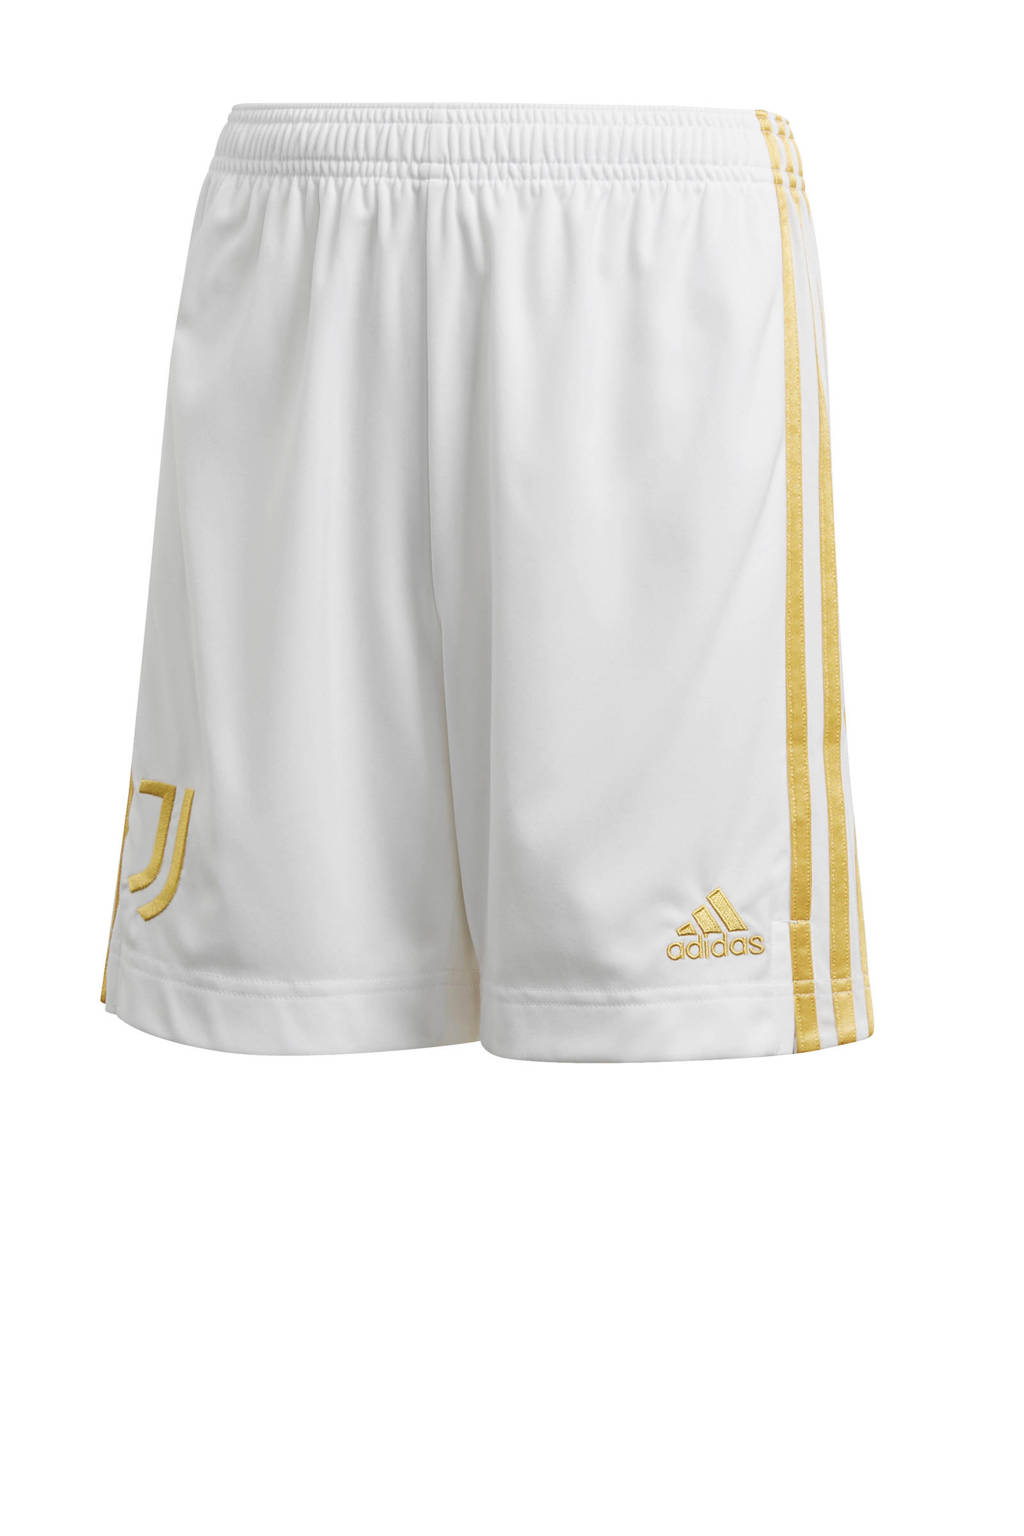 adidas Performance Junior Juventus voetbalshort Thuis wit/geel, Wit/geel